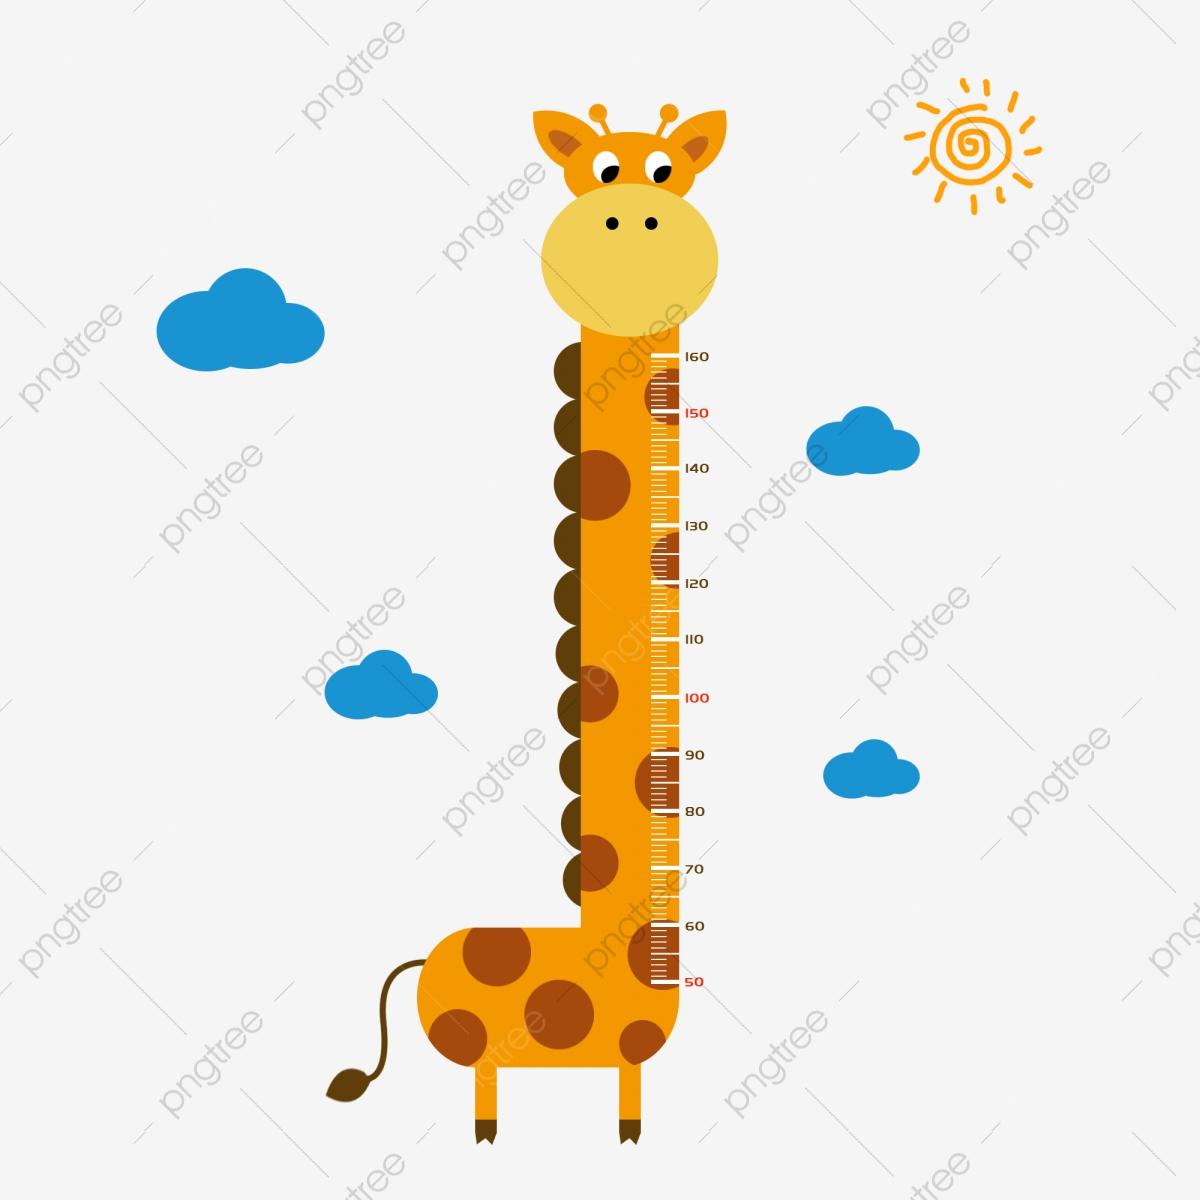 Giraffe clipart childrens. Children s height stickers